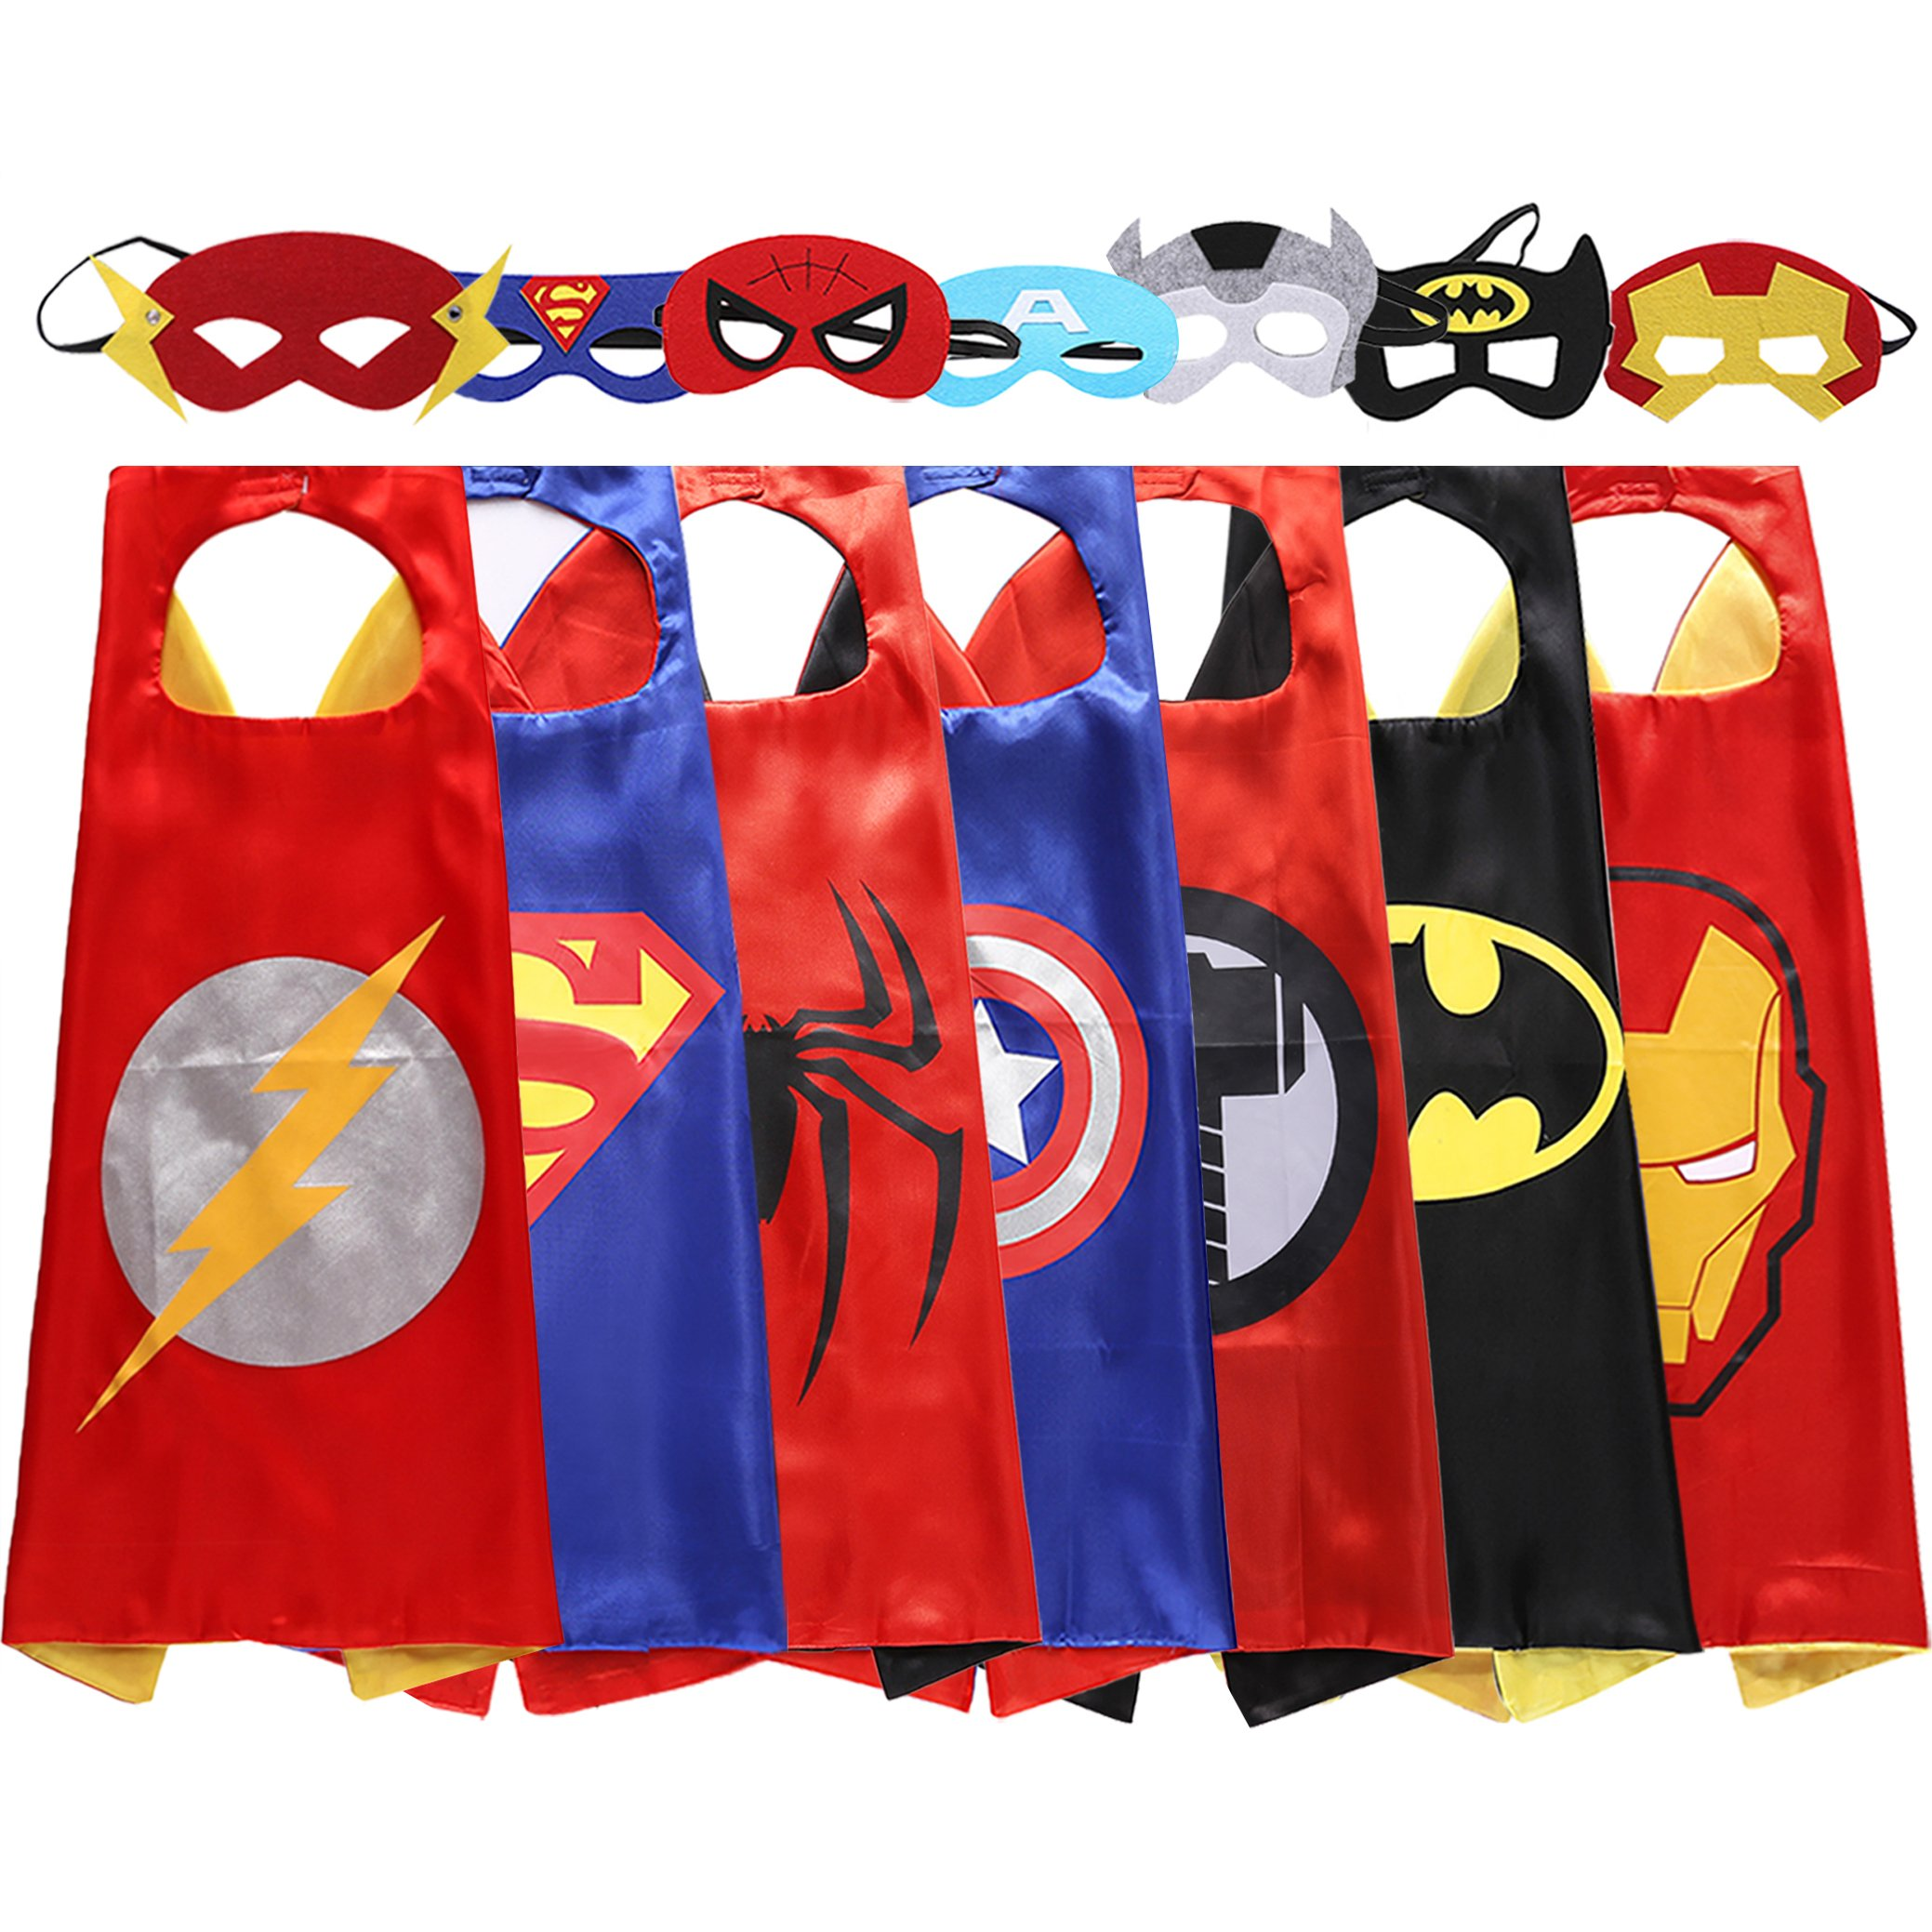 Lazu Superhero Dress up Costumes 7 Satin Capes with Felt Masks (r4)